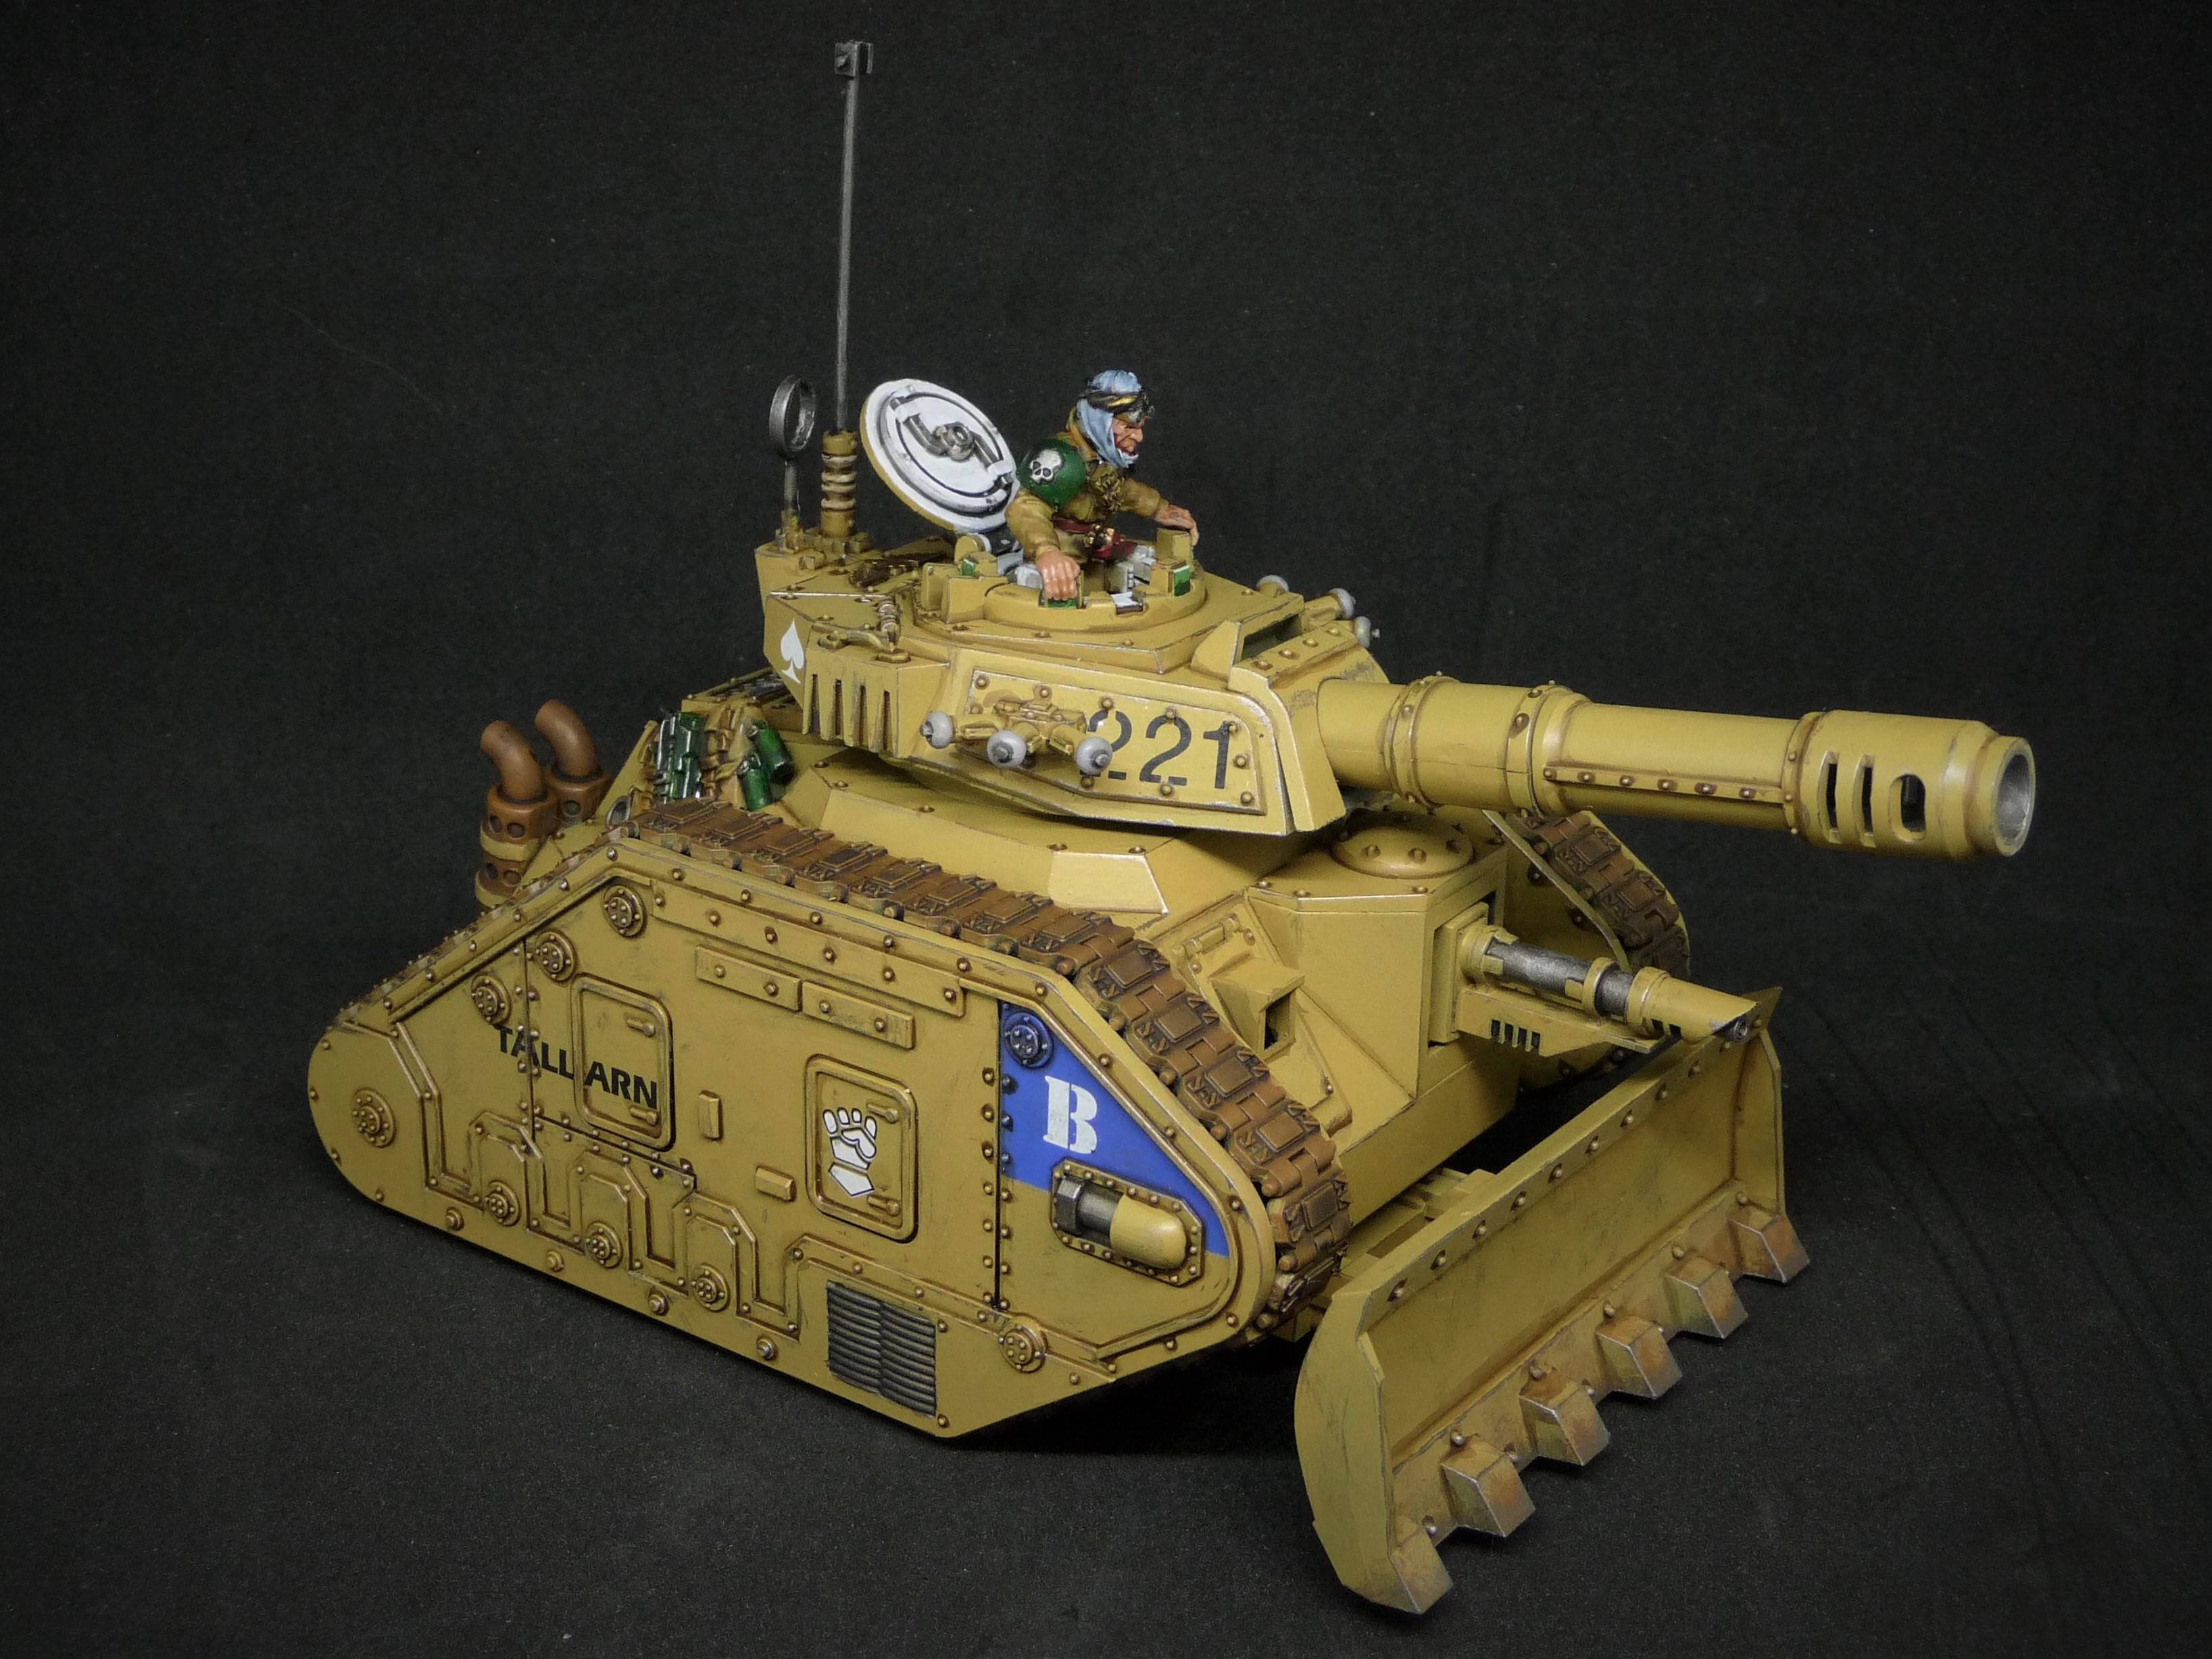 2nd Armoured Company, 331st Regiment, Leman Russ Tank, Second Squad Leader, Tallarn Desert Raiders, Vanquisher